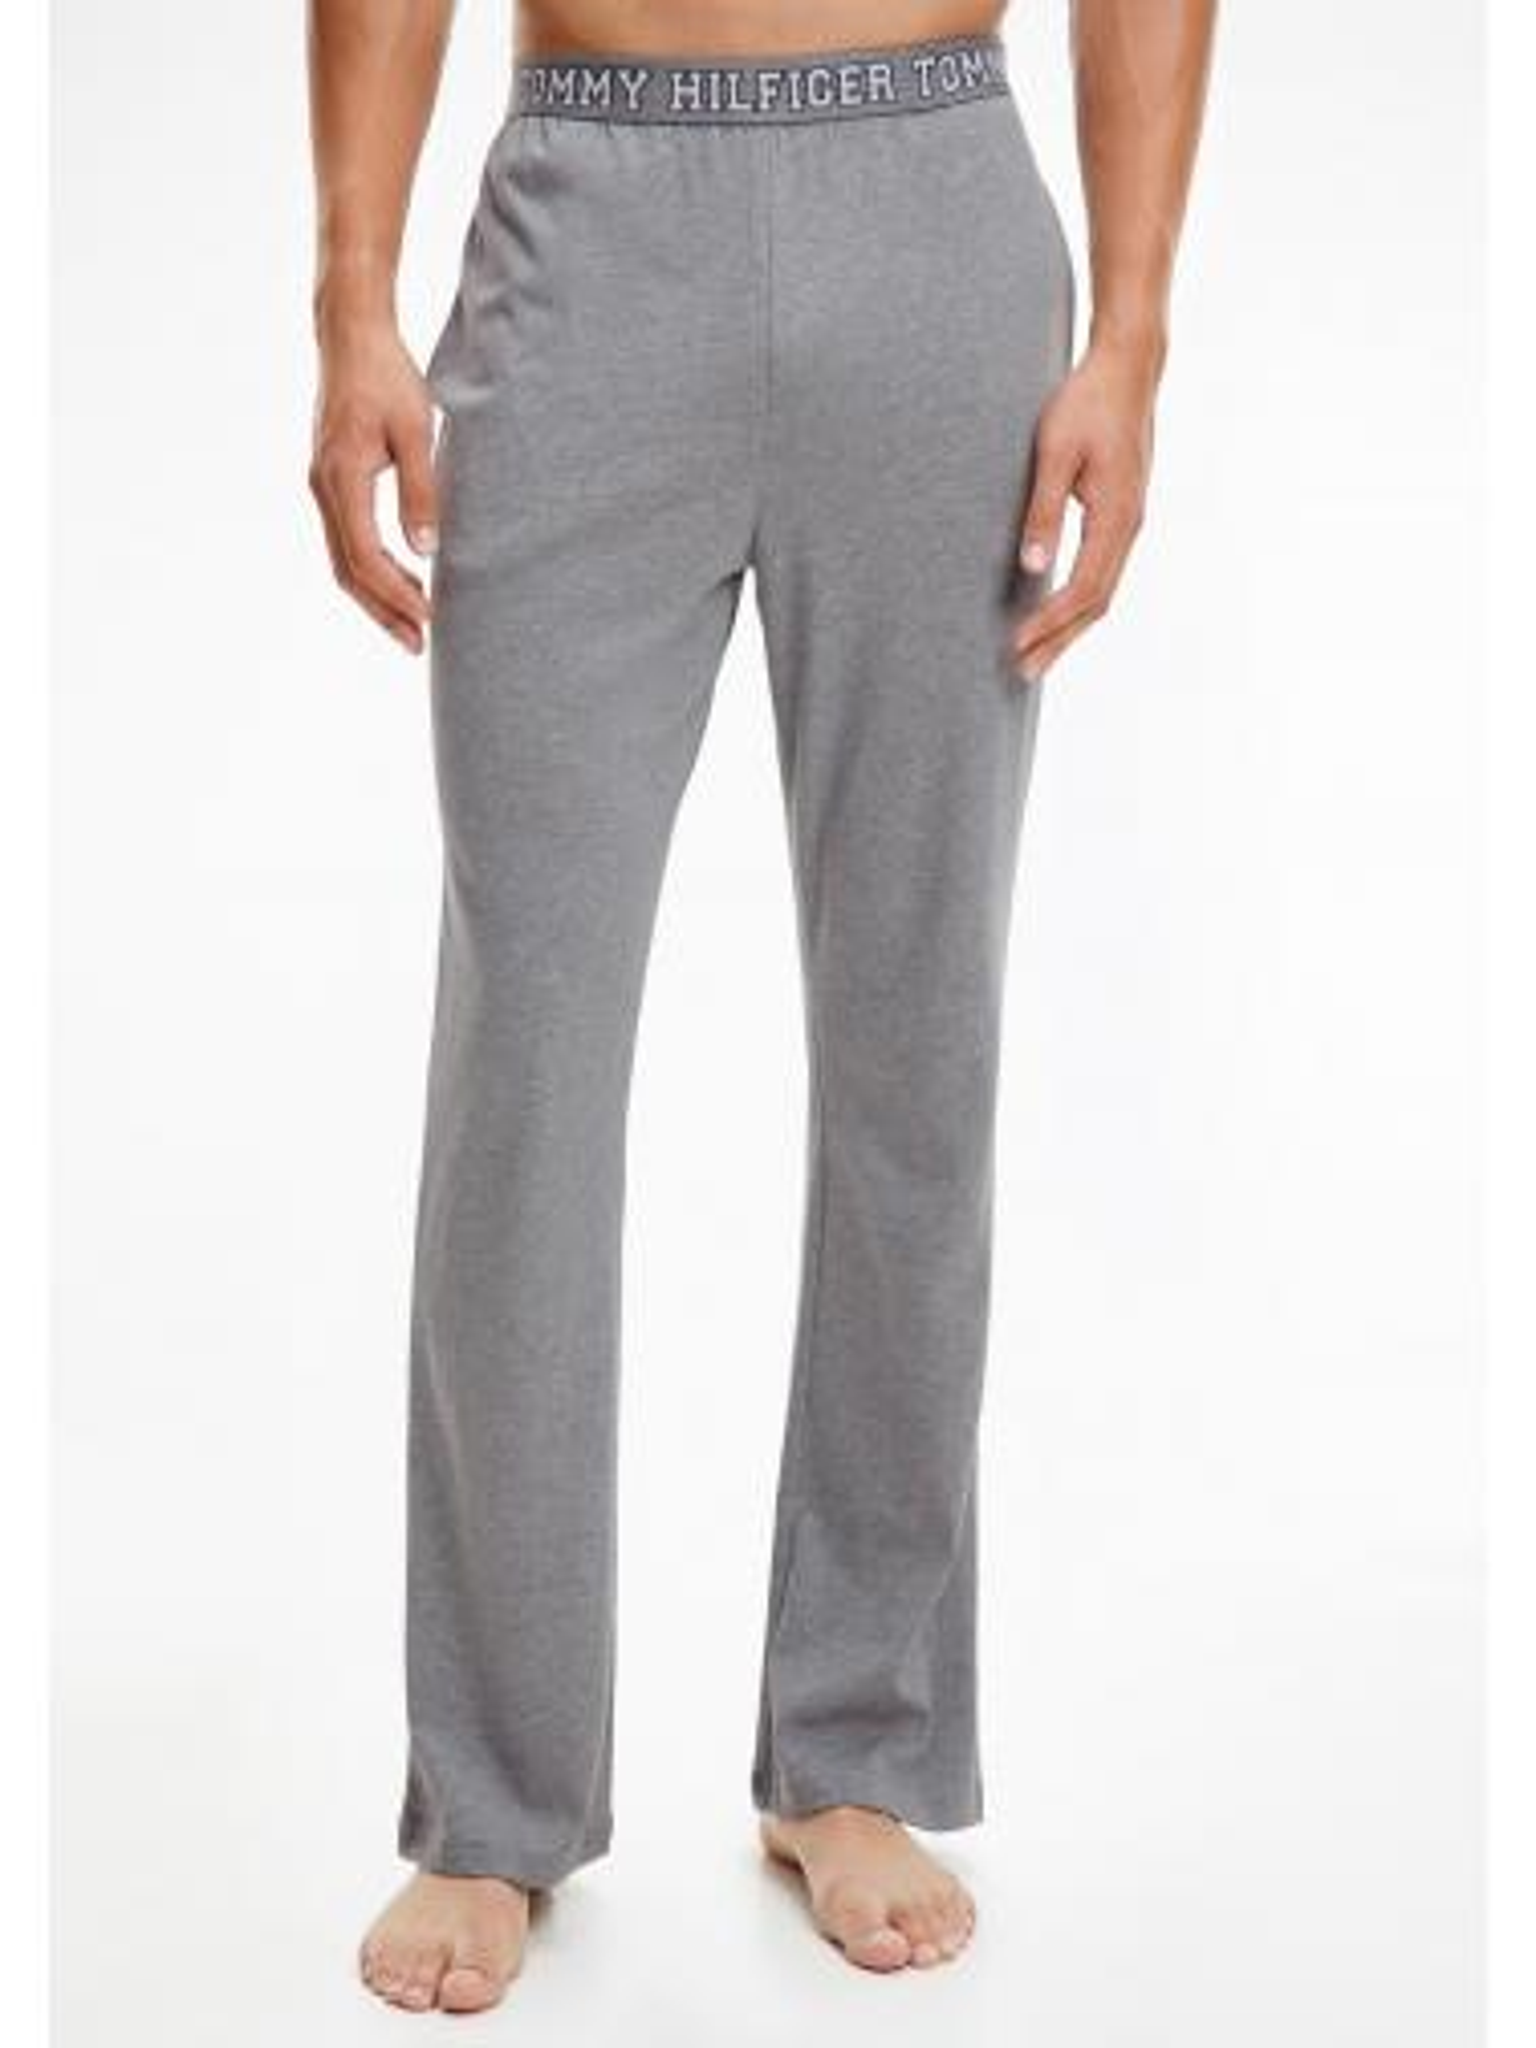 Pantalón Caballero Tommy Hilfiger University   -   - PEPI GUERRA